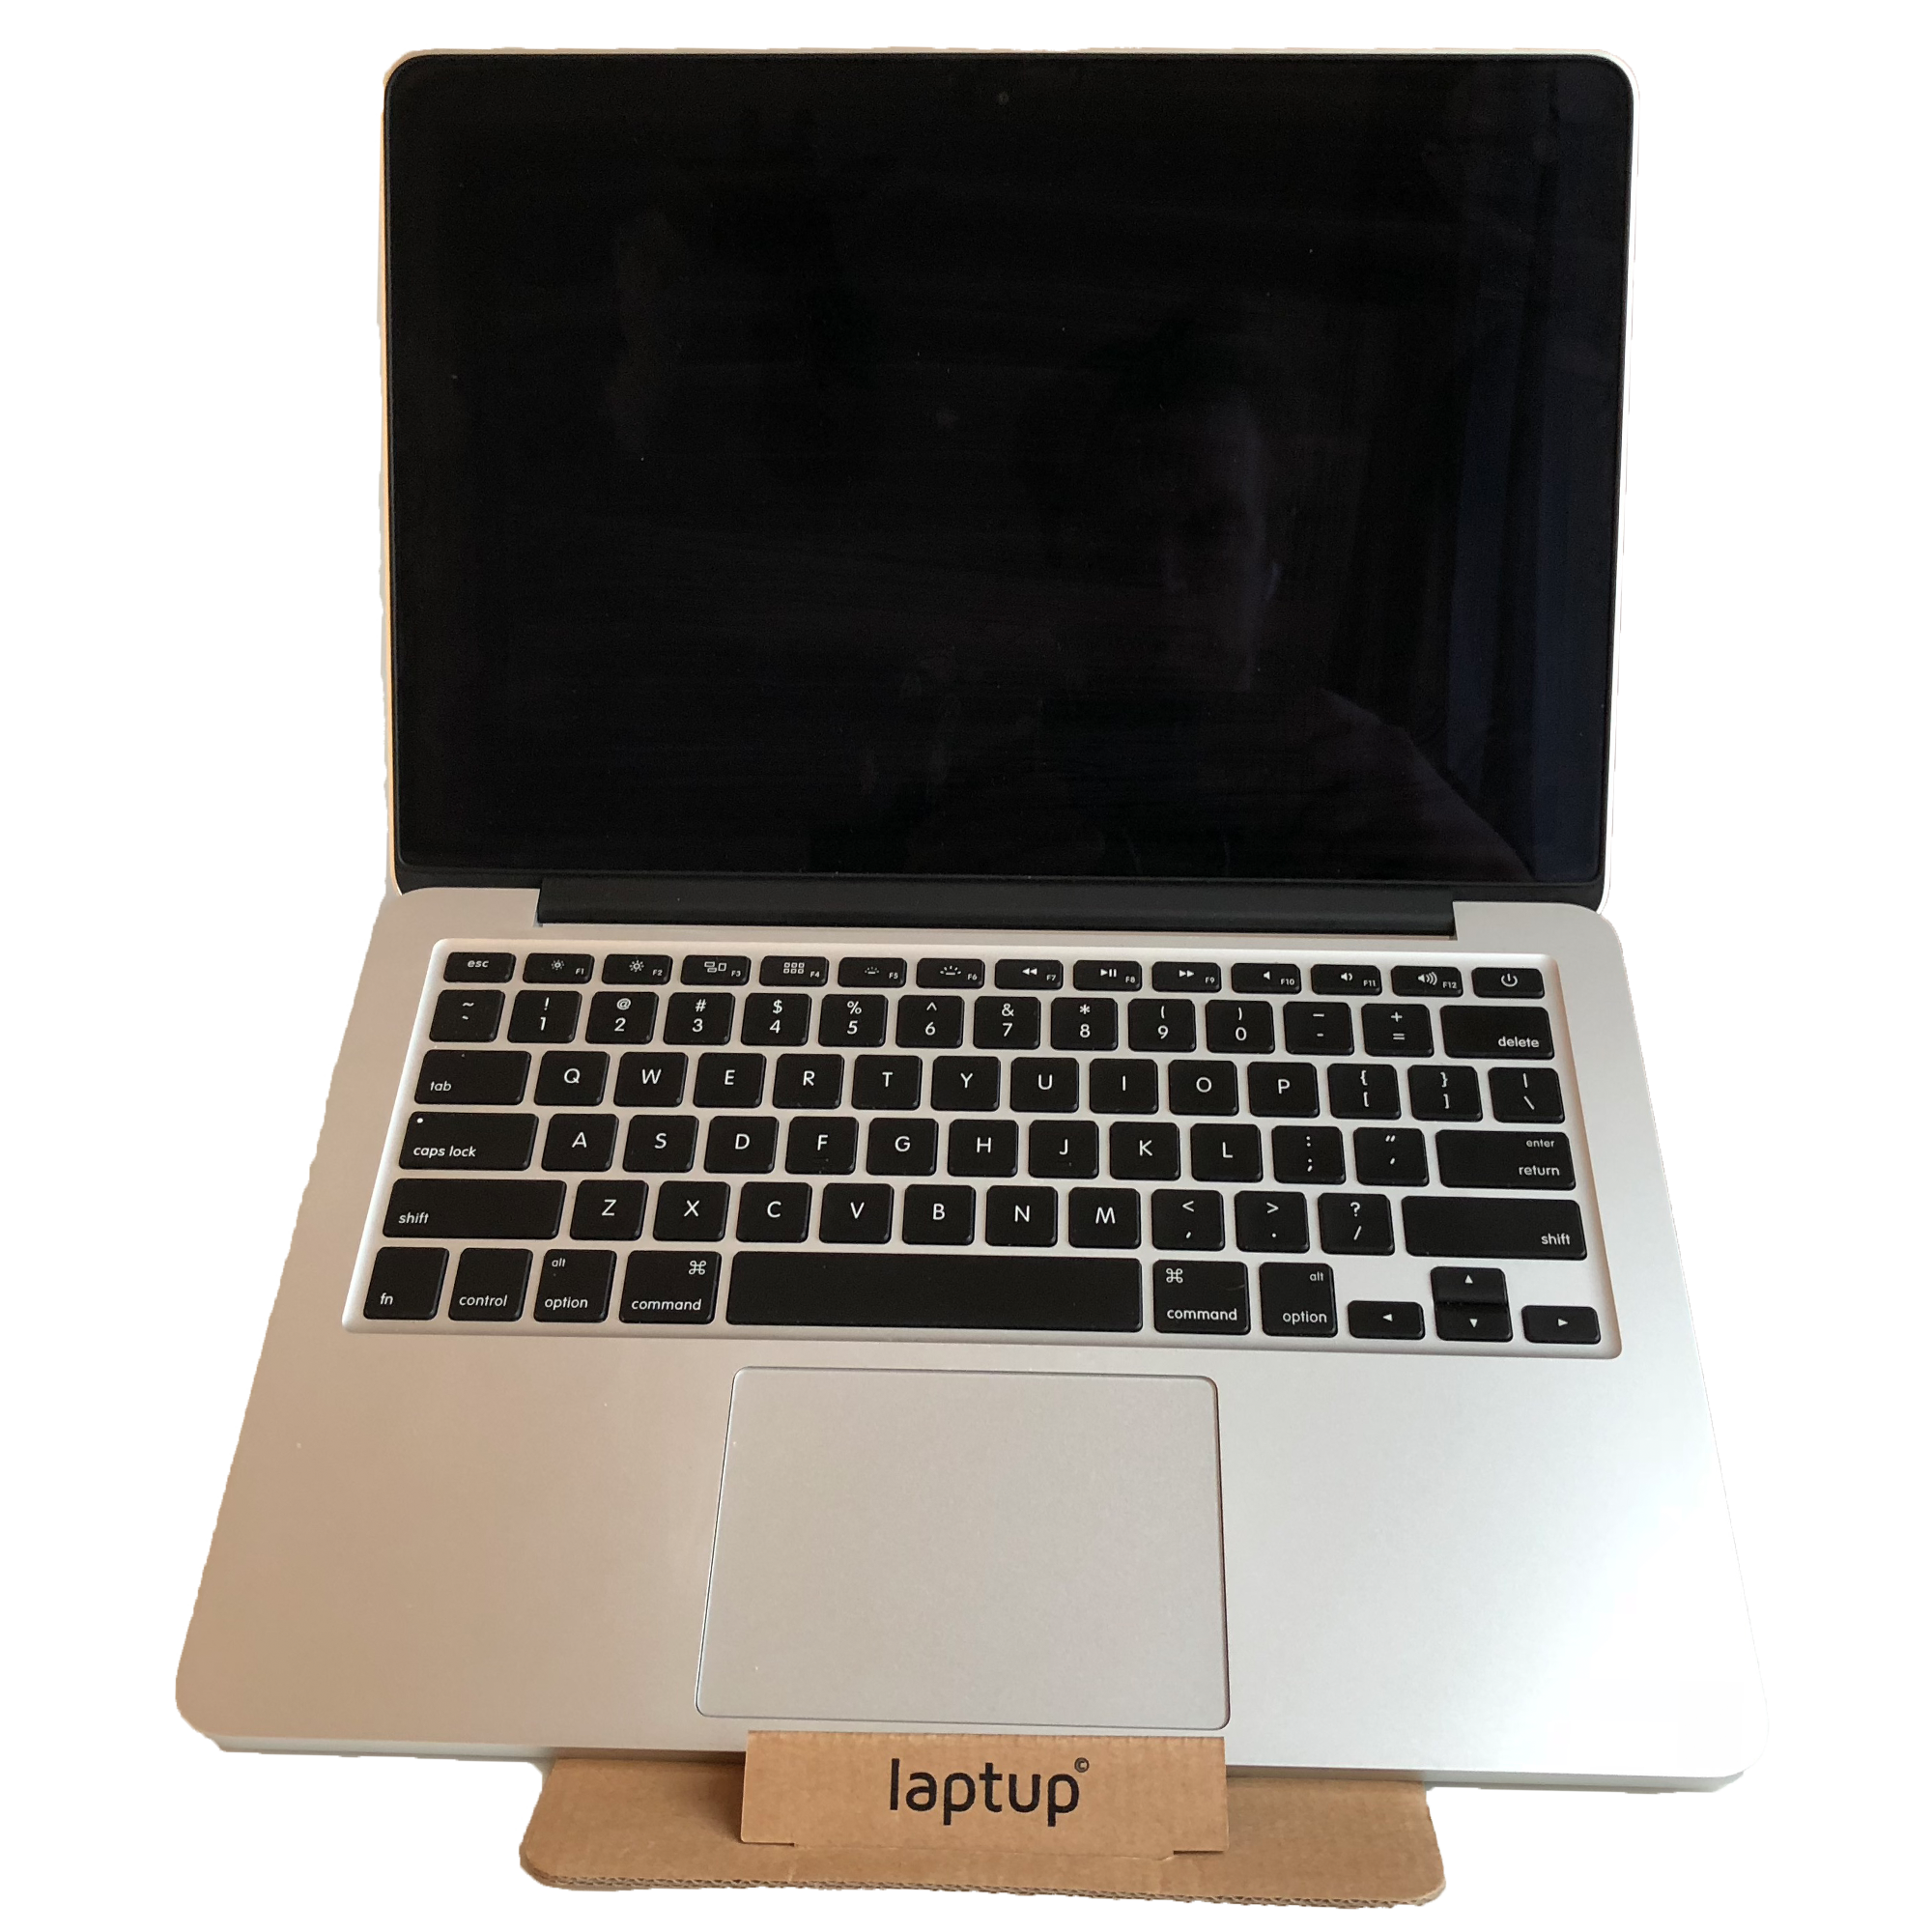 Laptup Classic 3.png